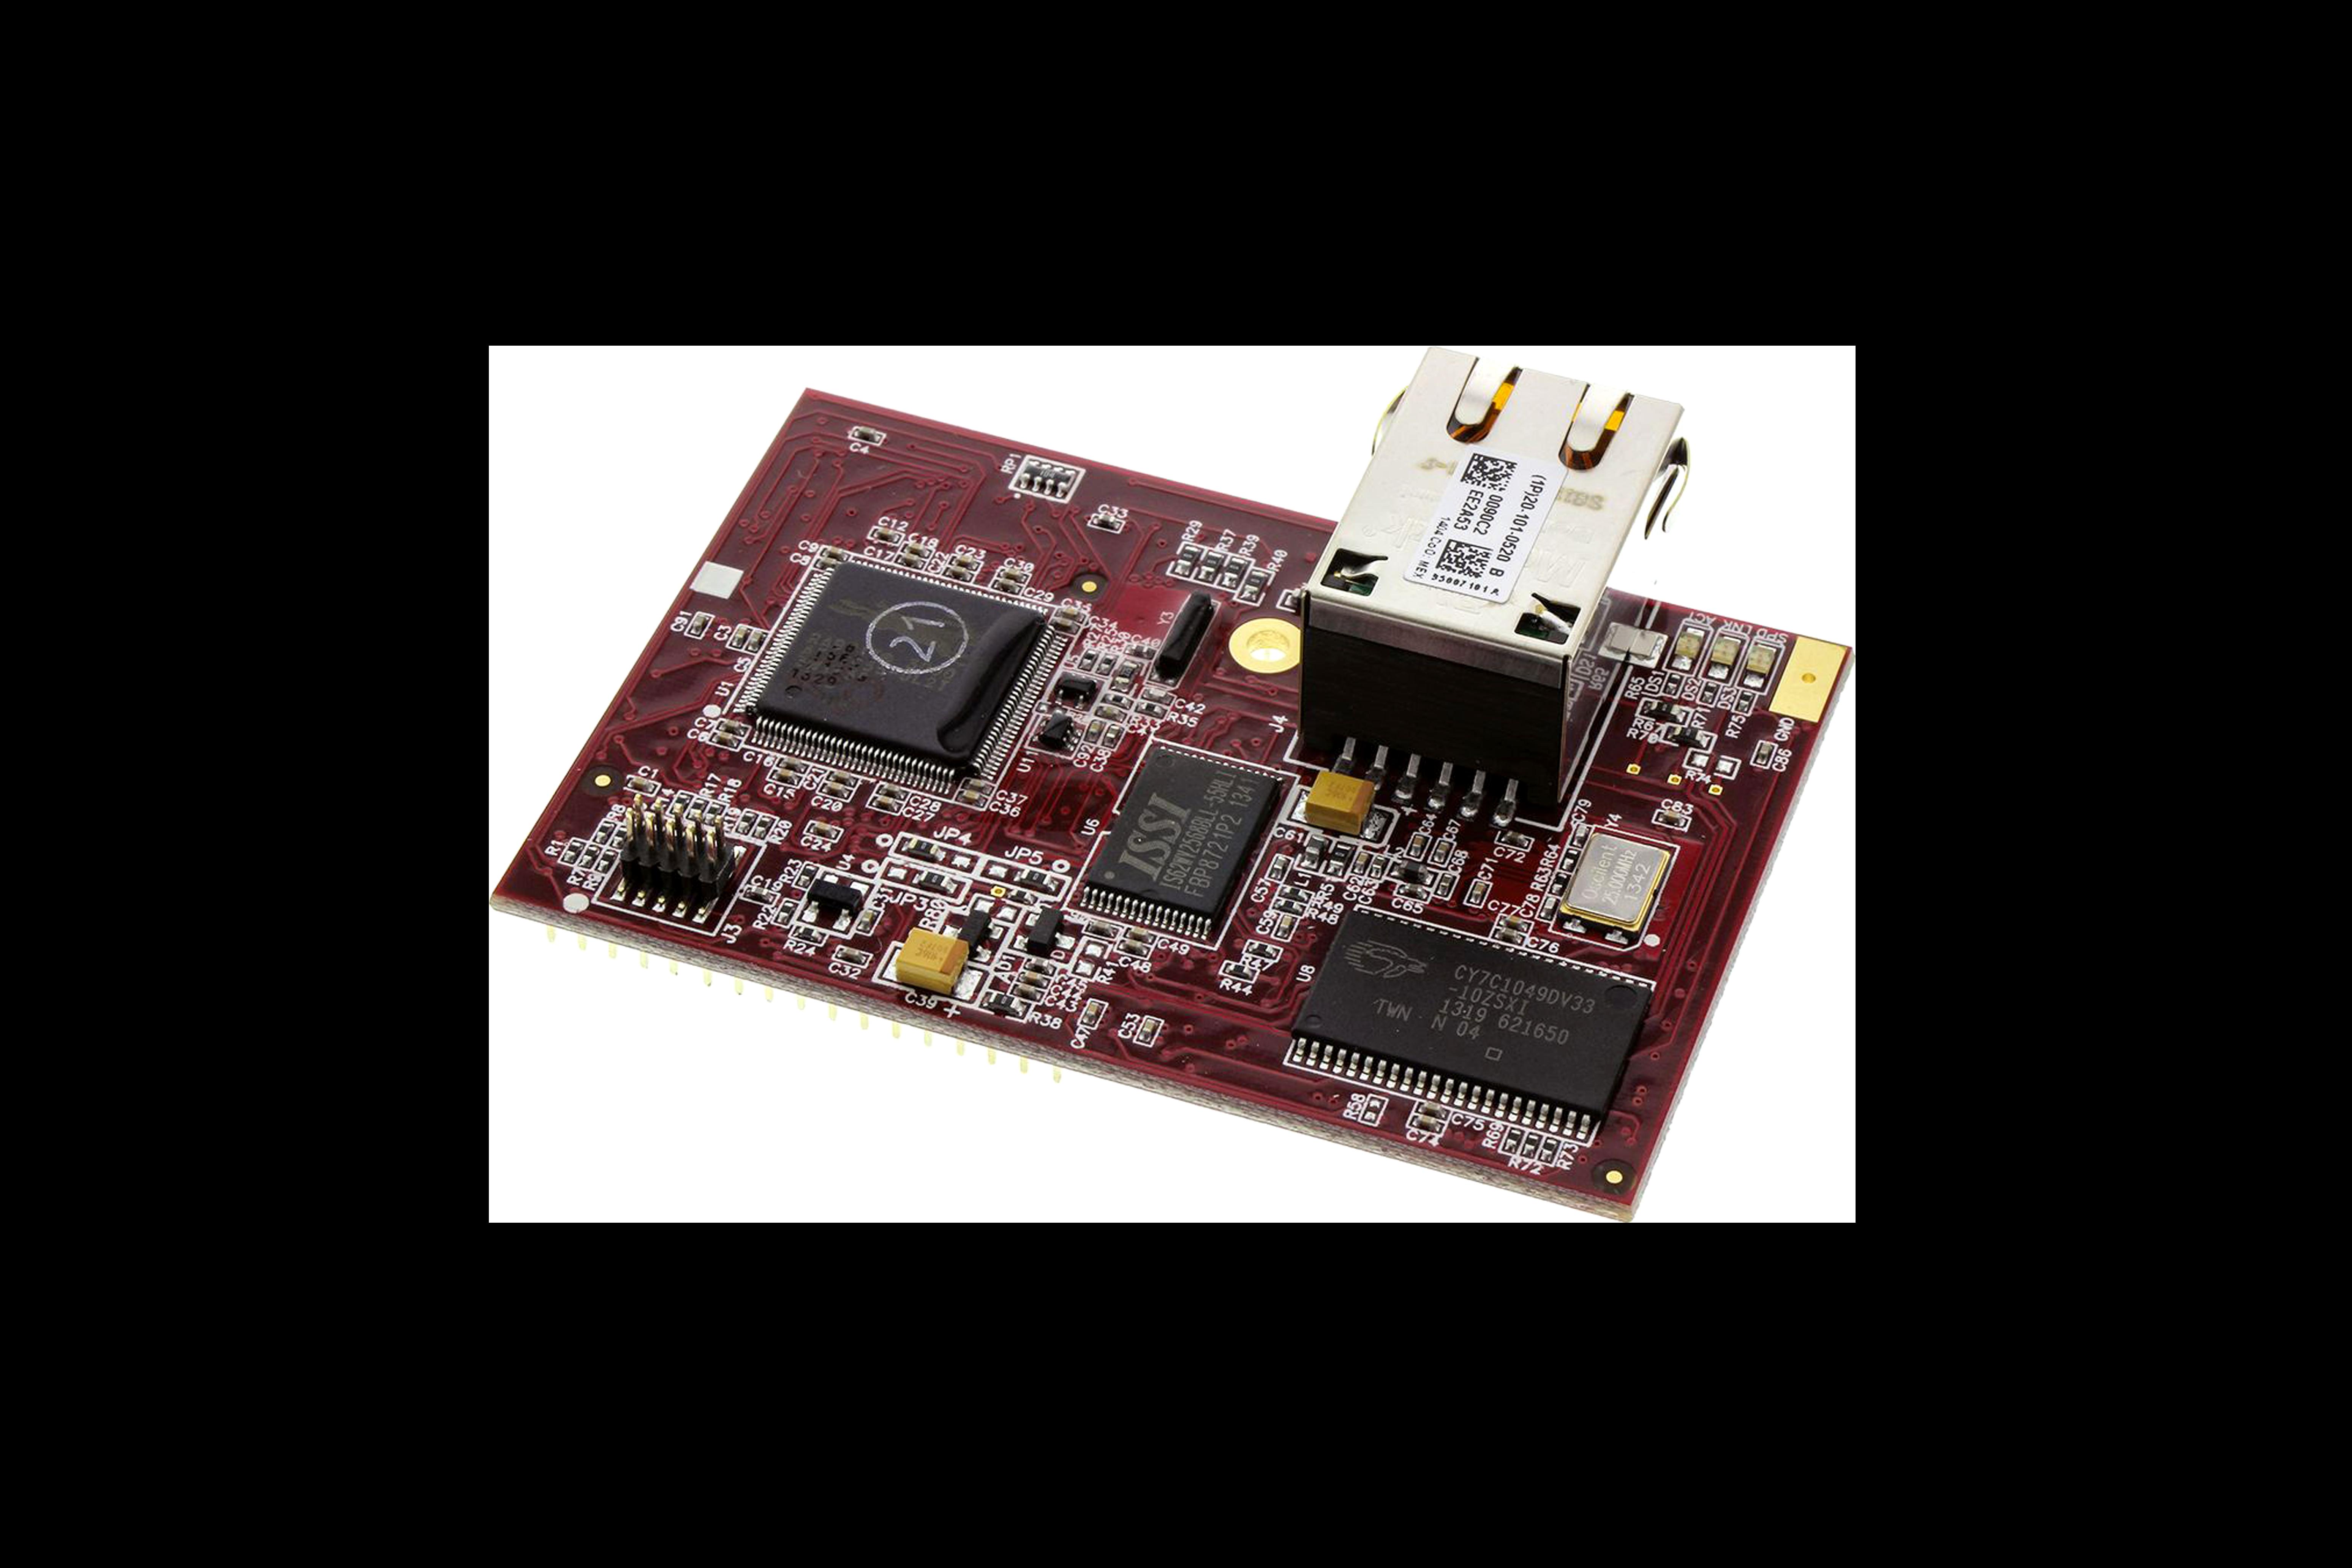 RabbitCore RCM3200 - 20-101-0520